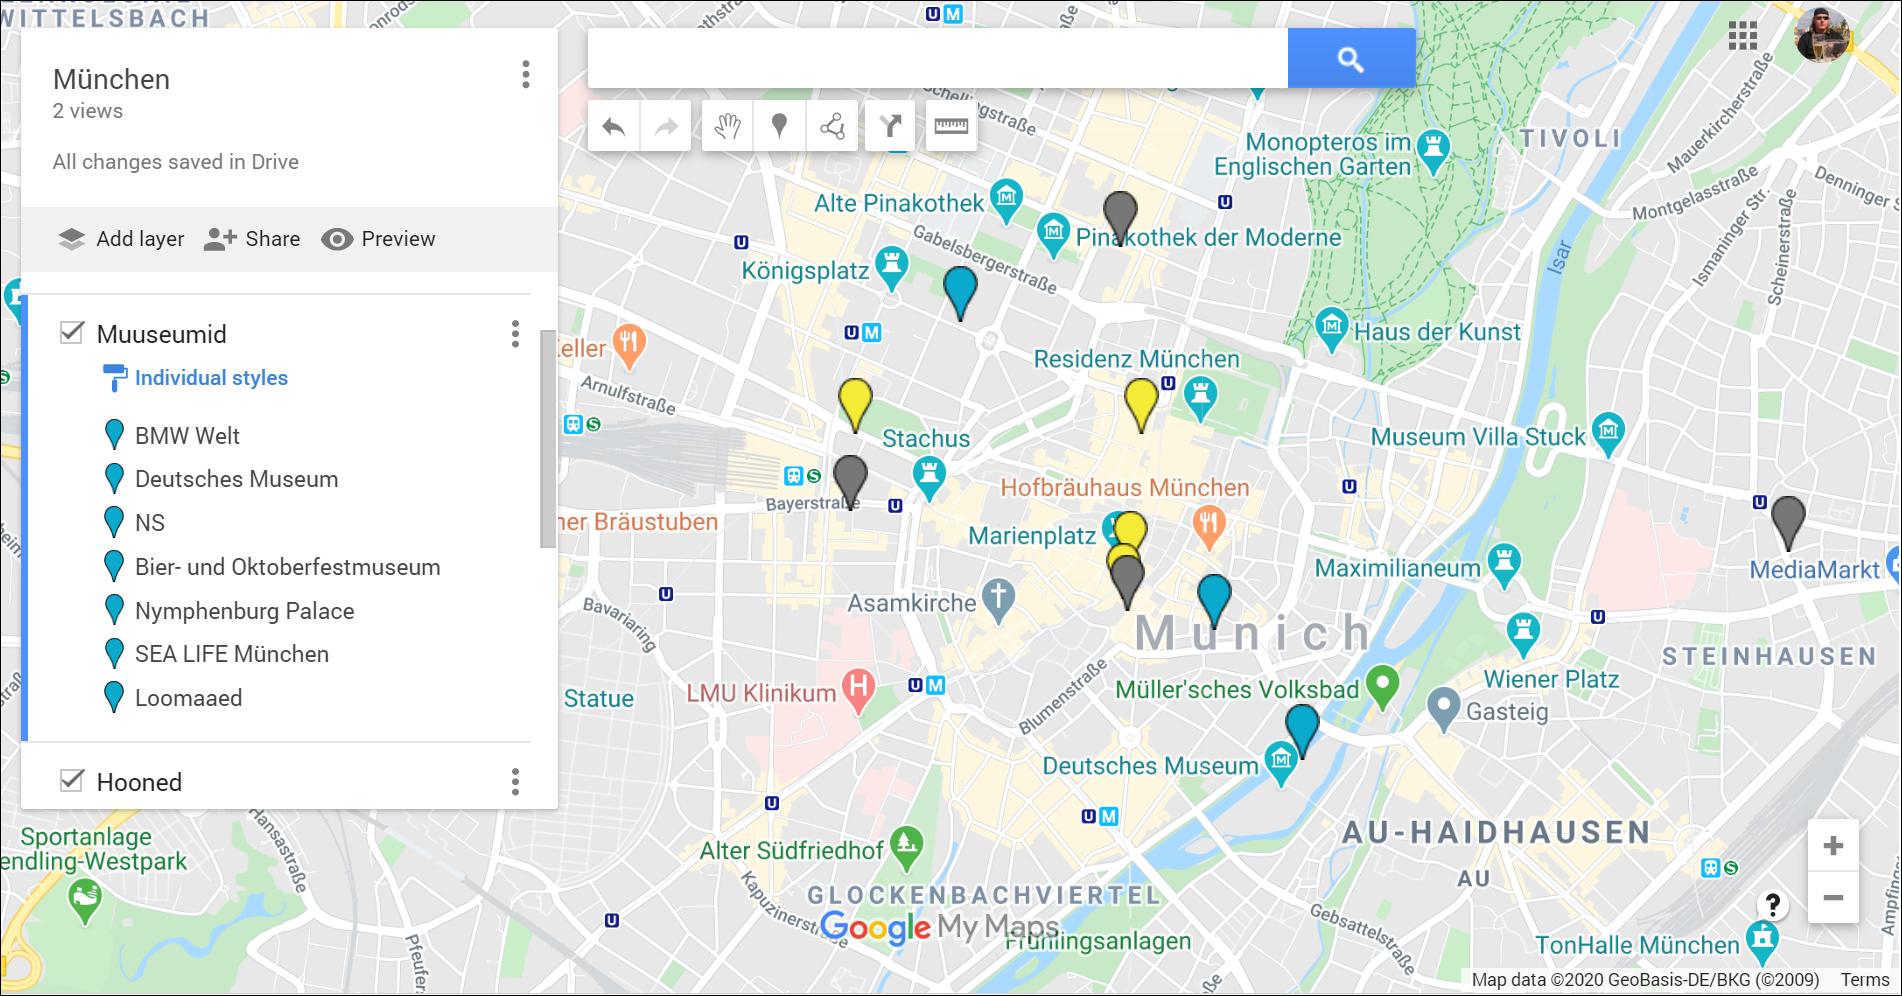 Munich attractions in Google My Maps